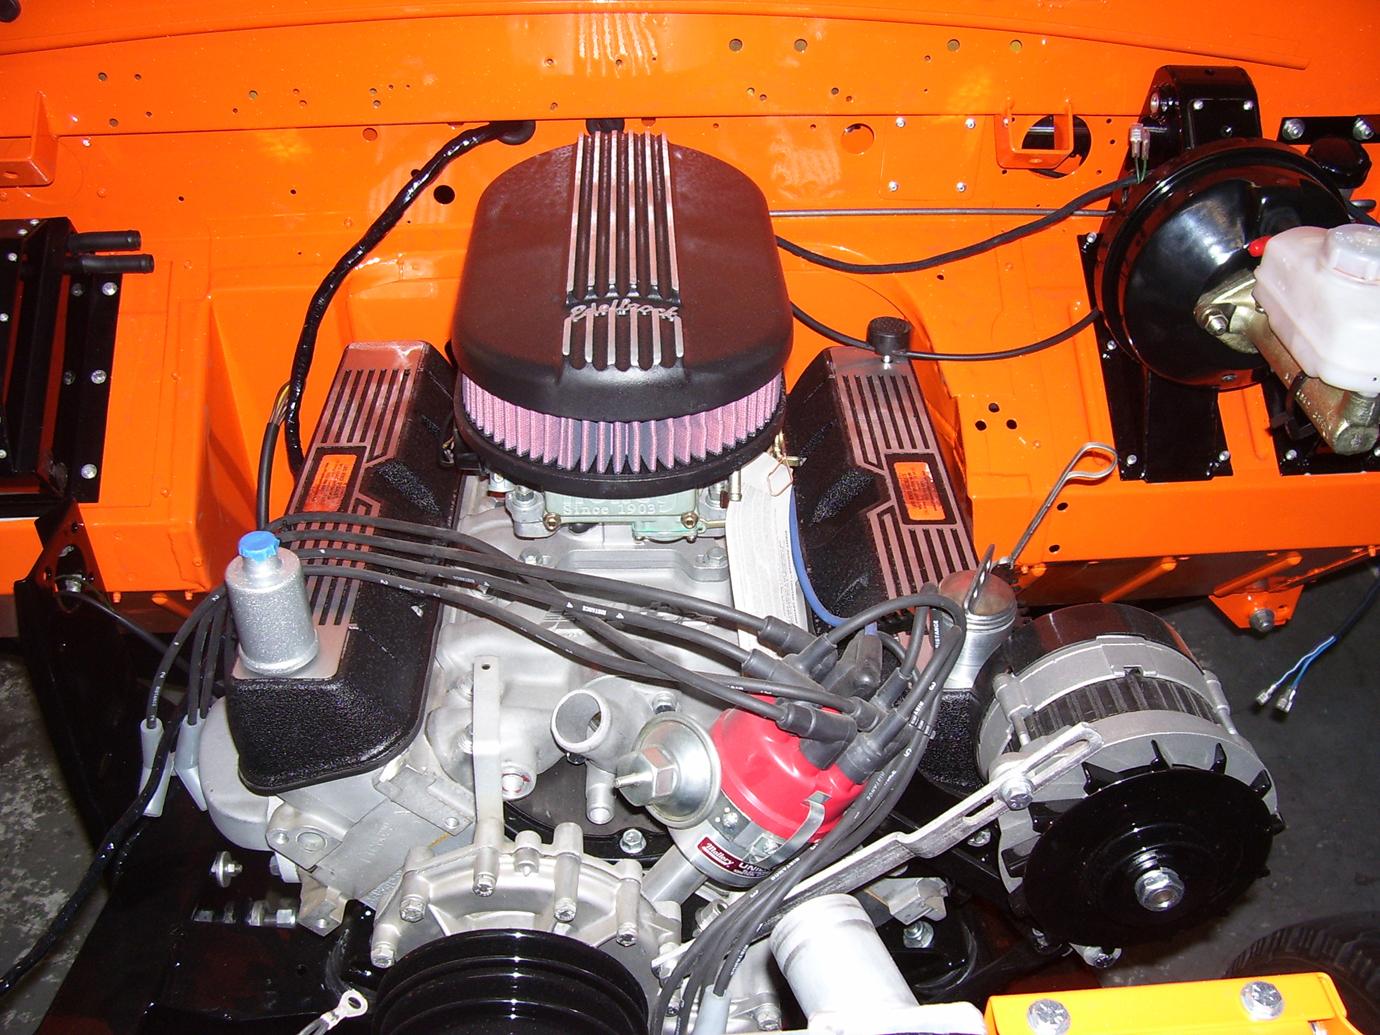 hight resolution of wcbr rover 3 5 litre v8 with holley 470 truckmaster carb jwr offy dualport intake special carb raiser edelbrock oval black k n filter